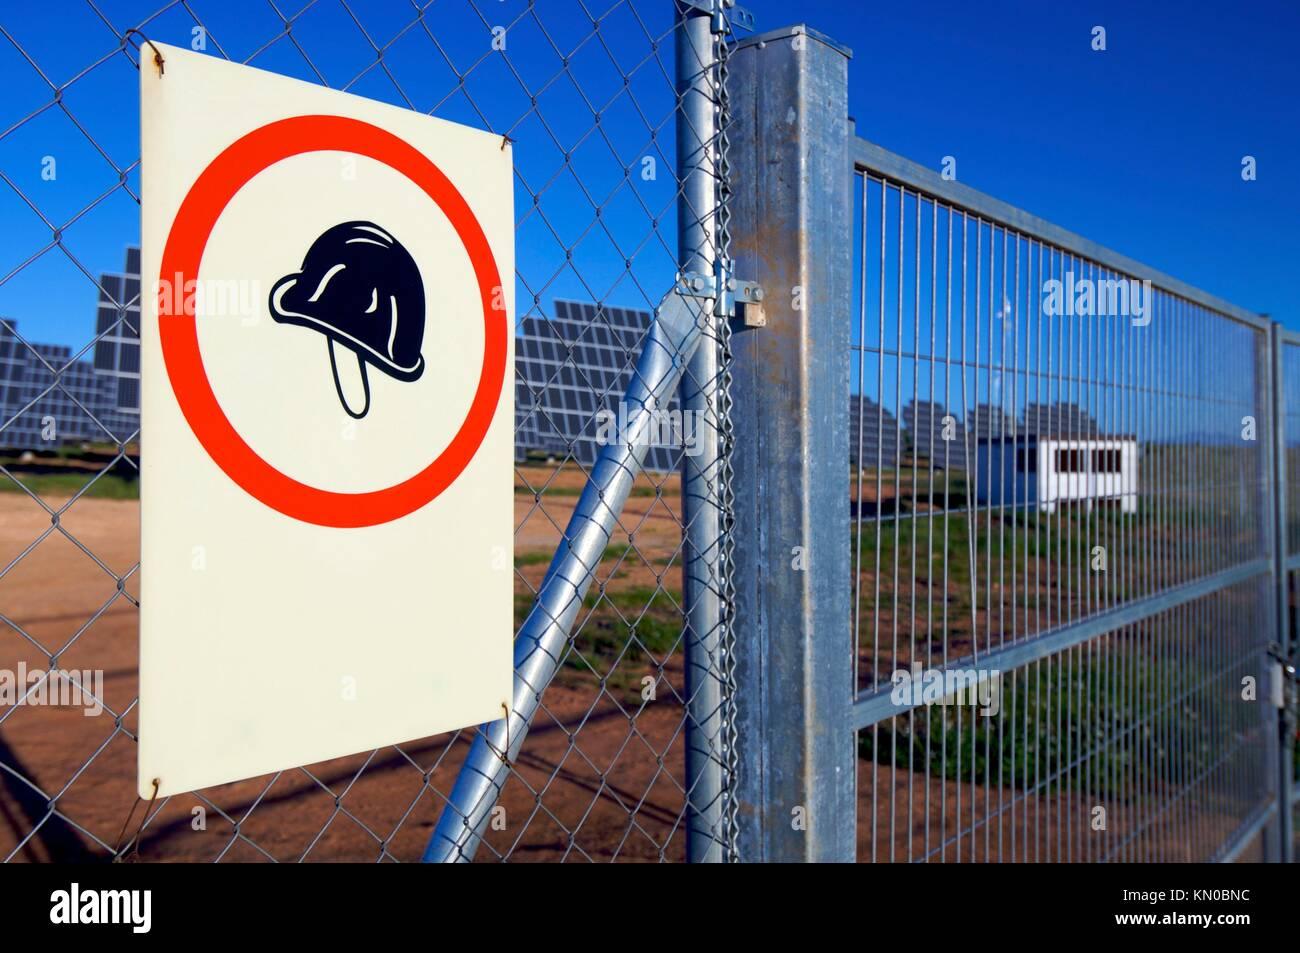 poster for mandatory use of helmets, Cosuenda, Zaragoza, Aragon, Spain - Stock Image